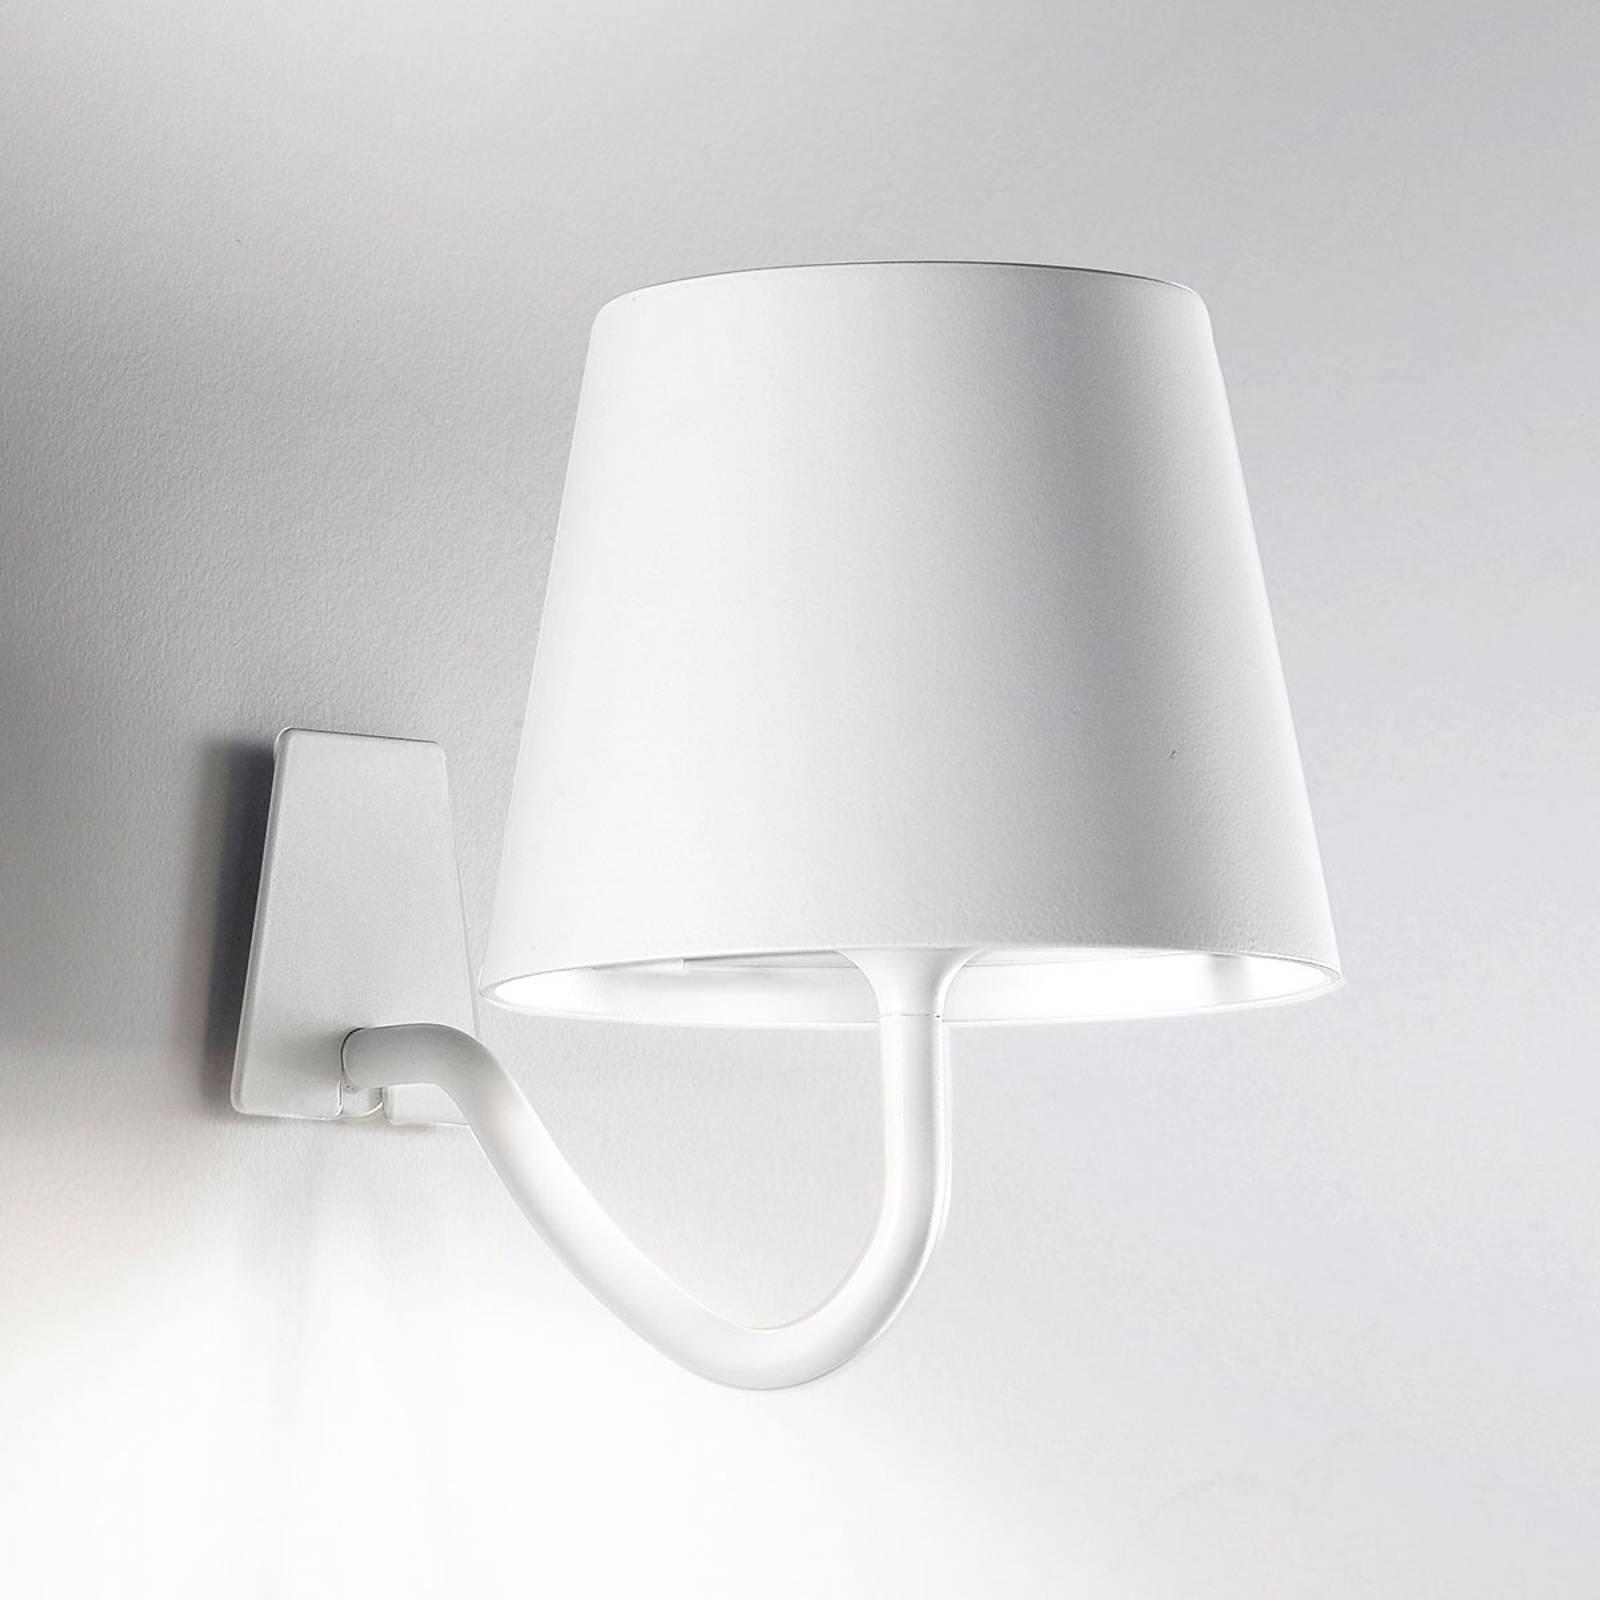 LED-Wandleuchte Poldina dimmbar, mit Akku, weiß